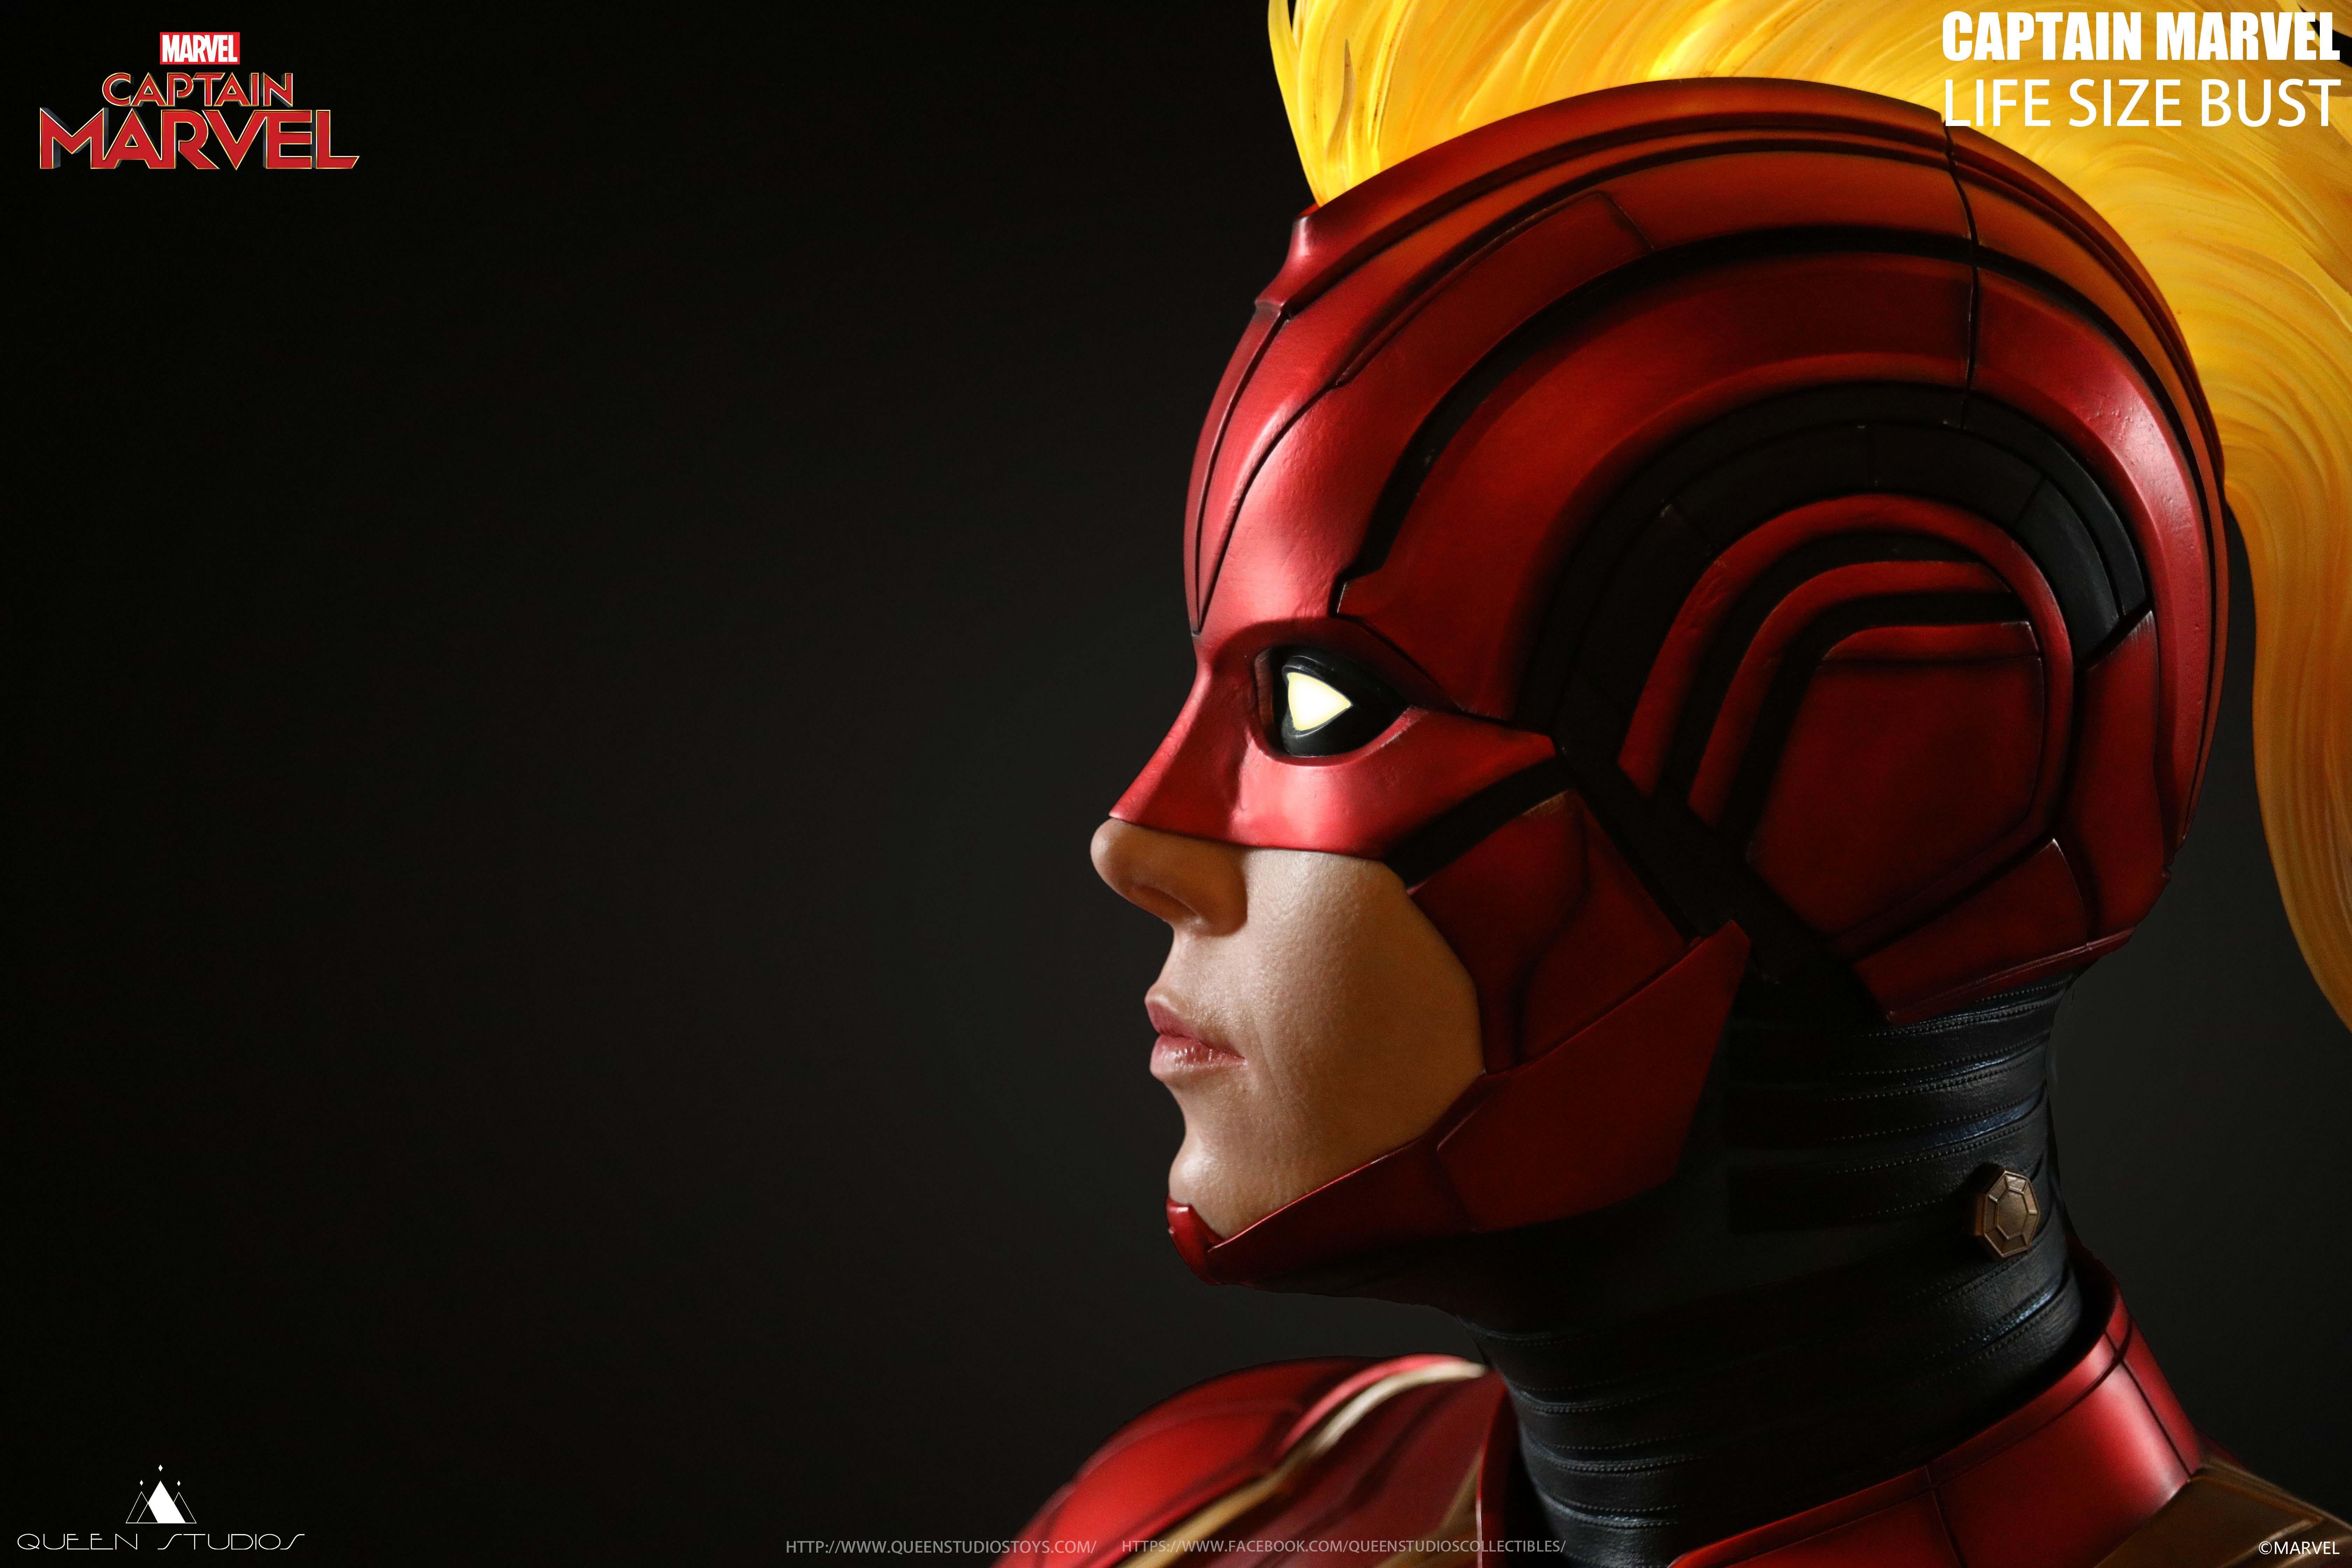 Captain Marvel Life Size Bust dalla Queen Studios